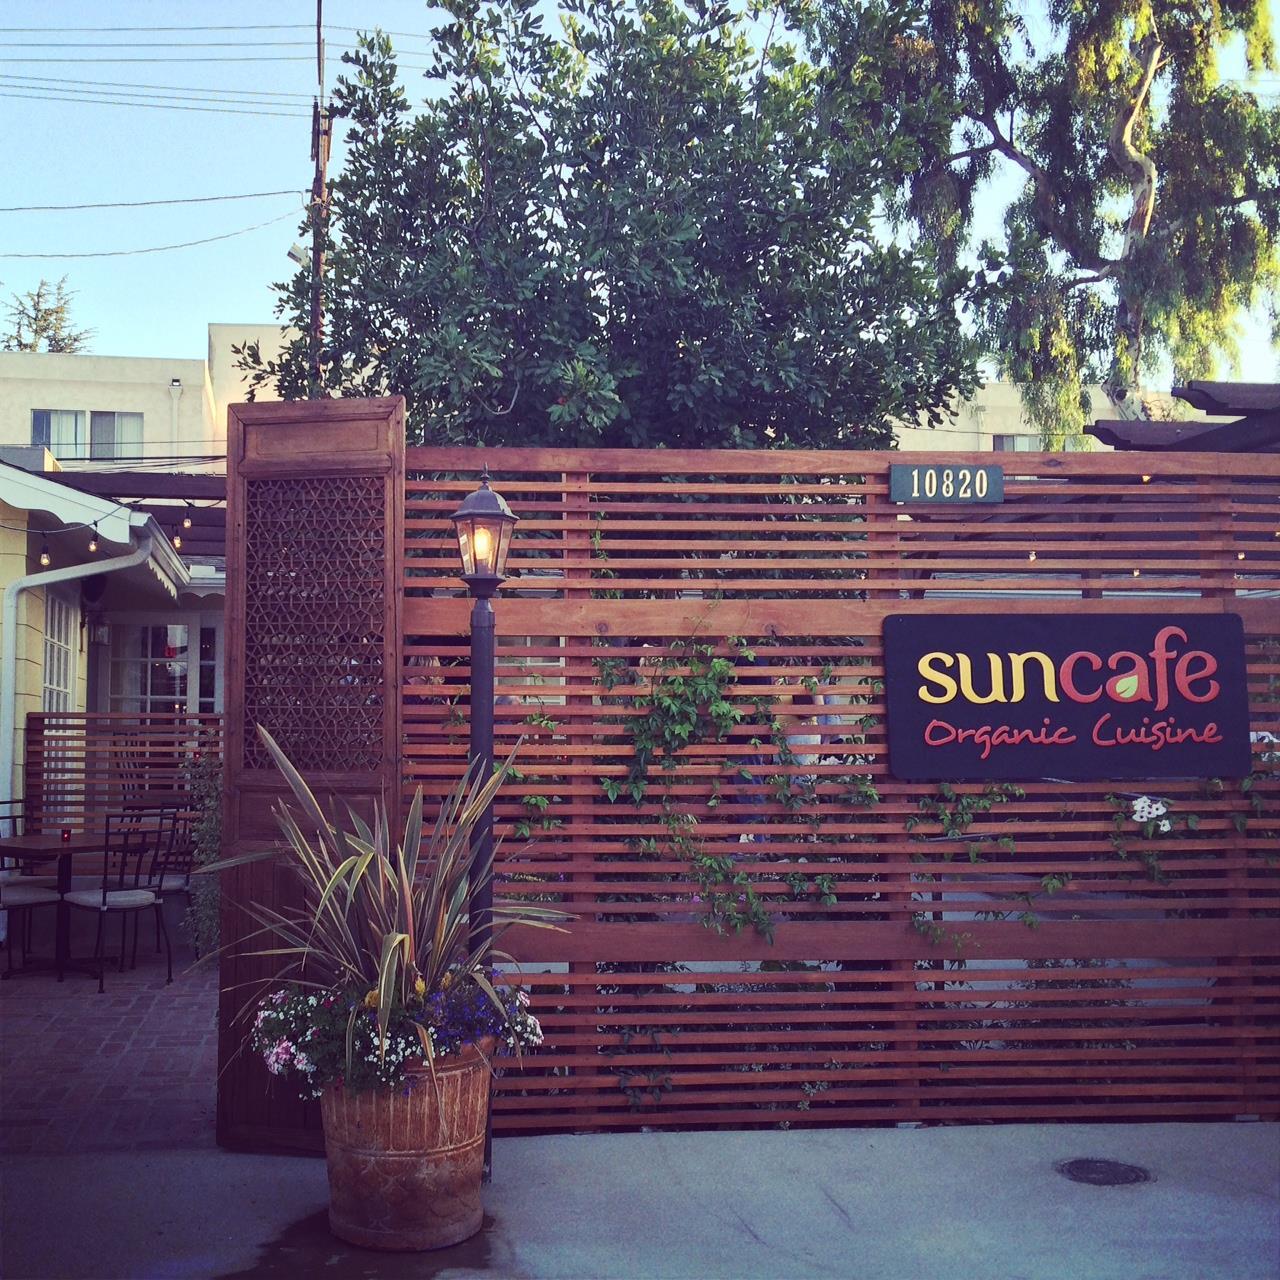 SunCafe On New Year's Eve